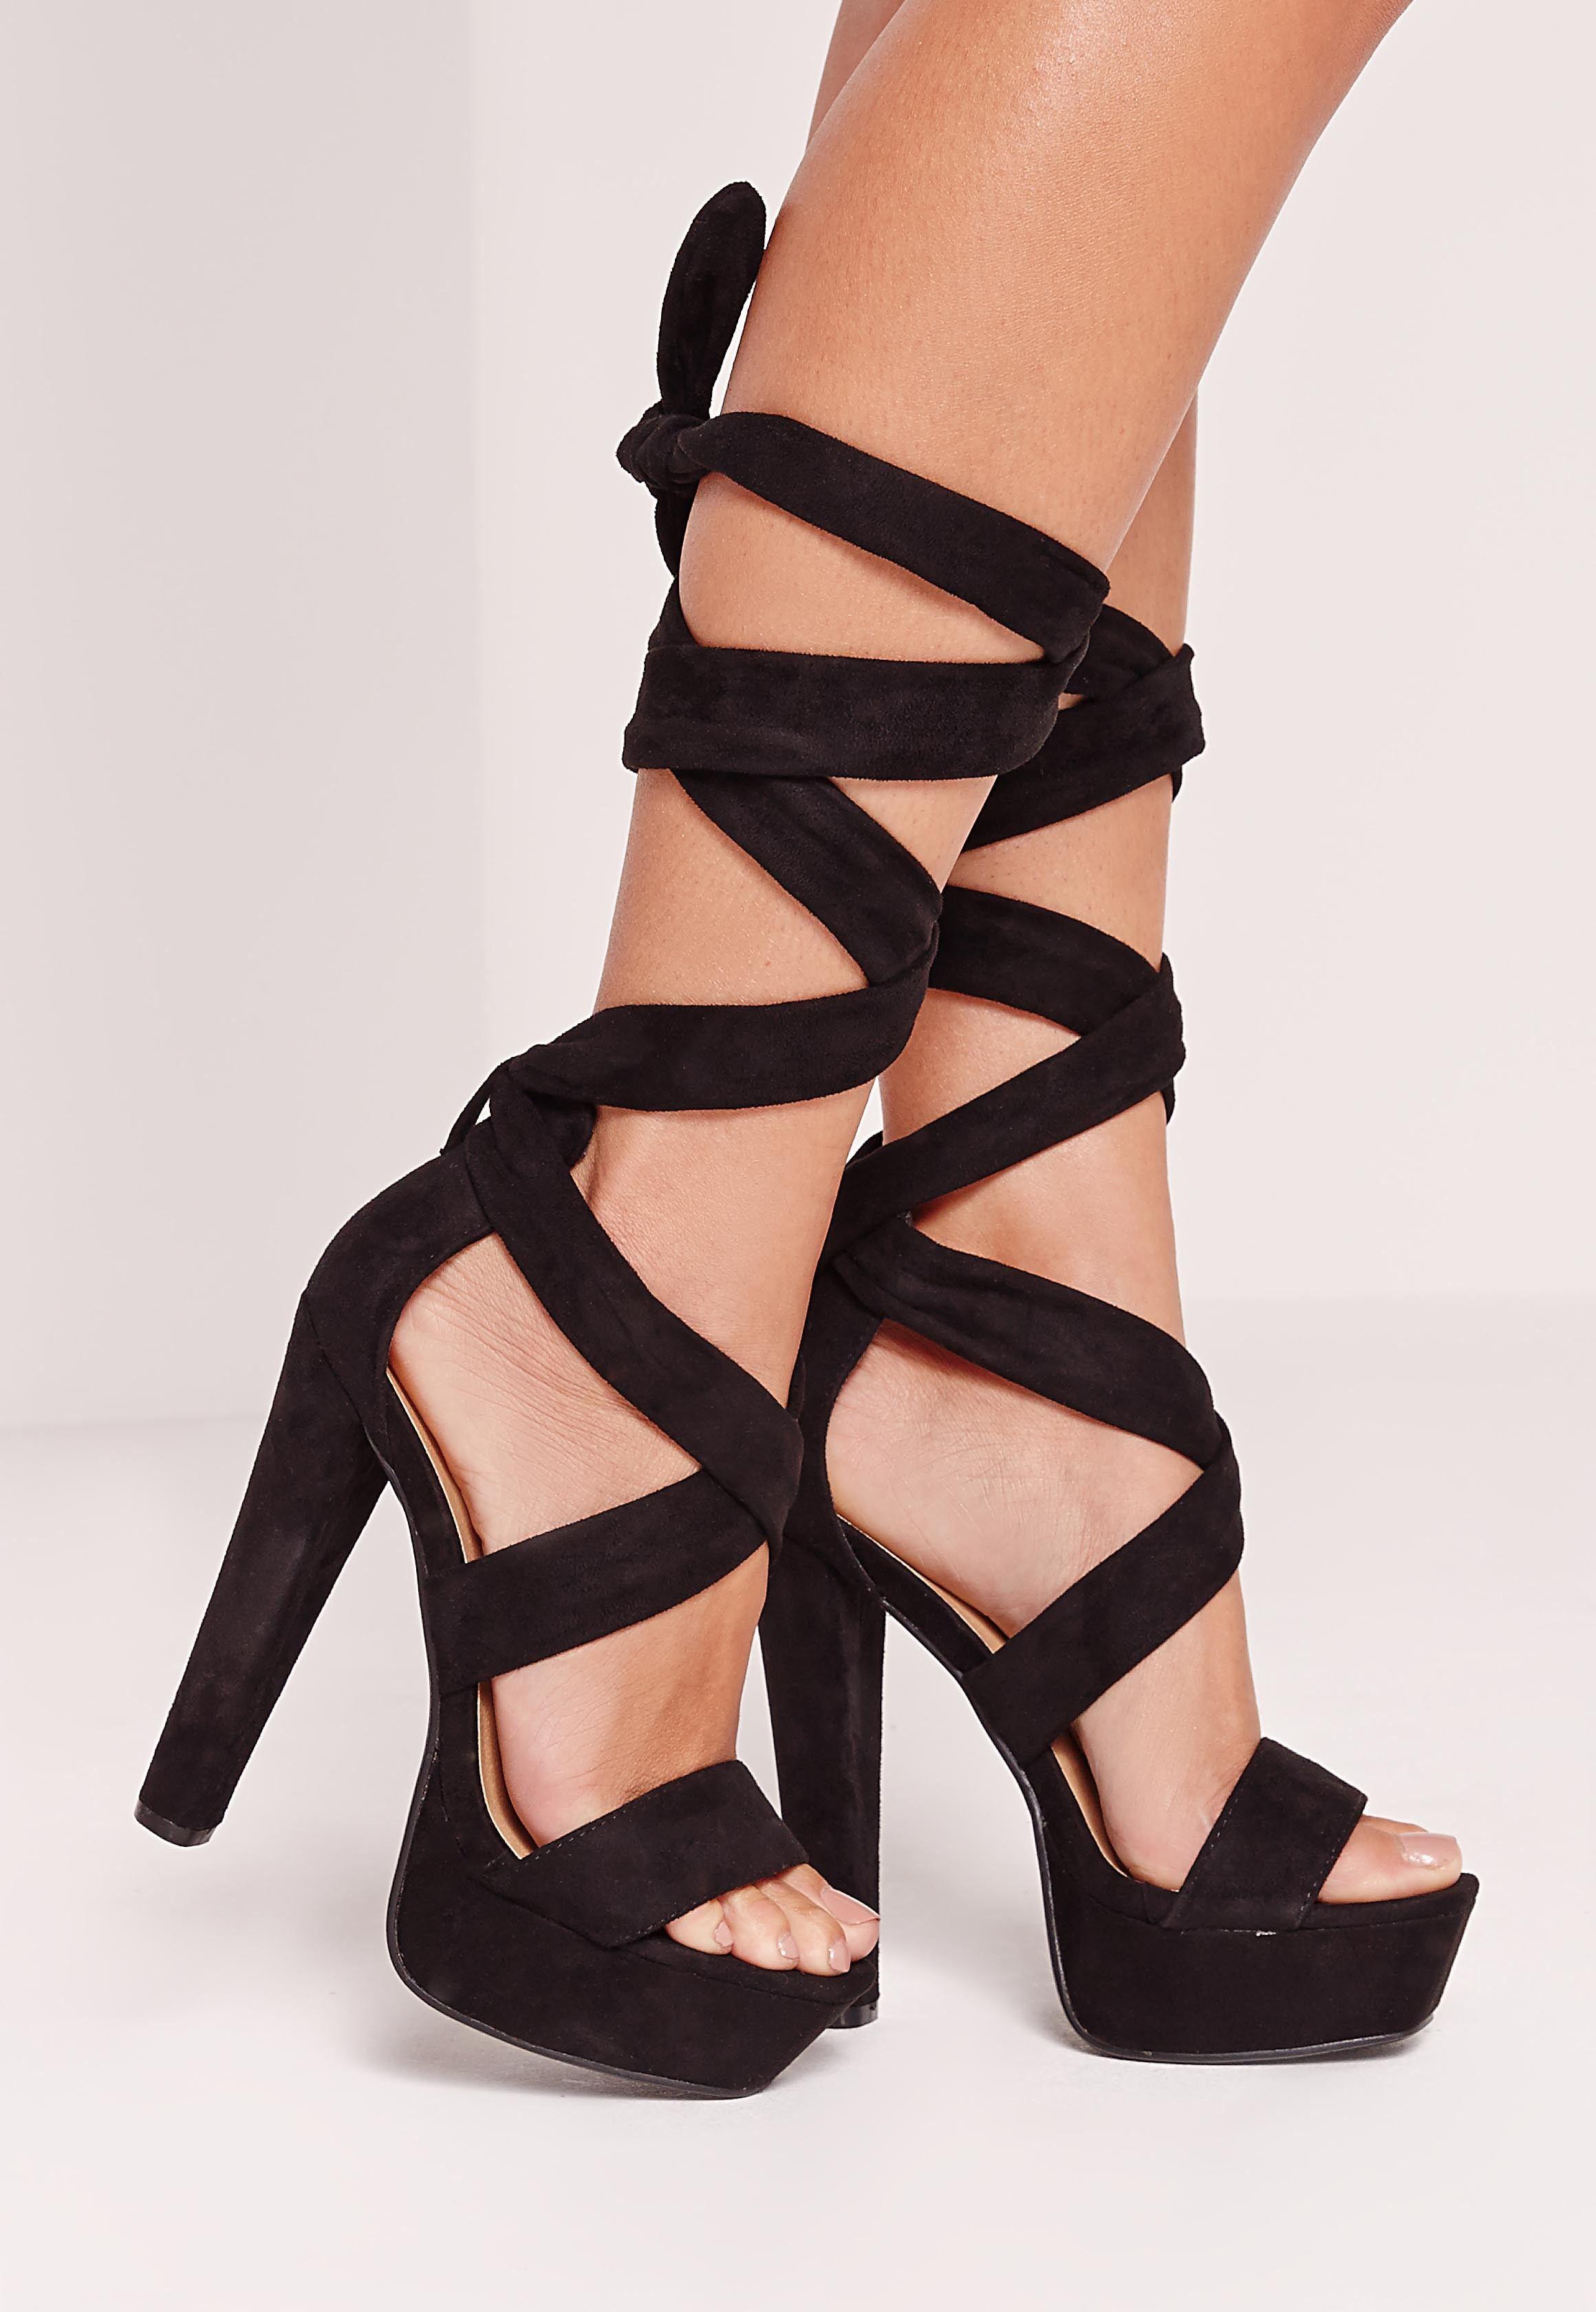 9398a420500d Missguided - Wrap Around Platform Sandals Black